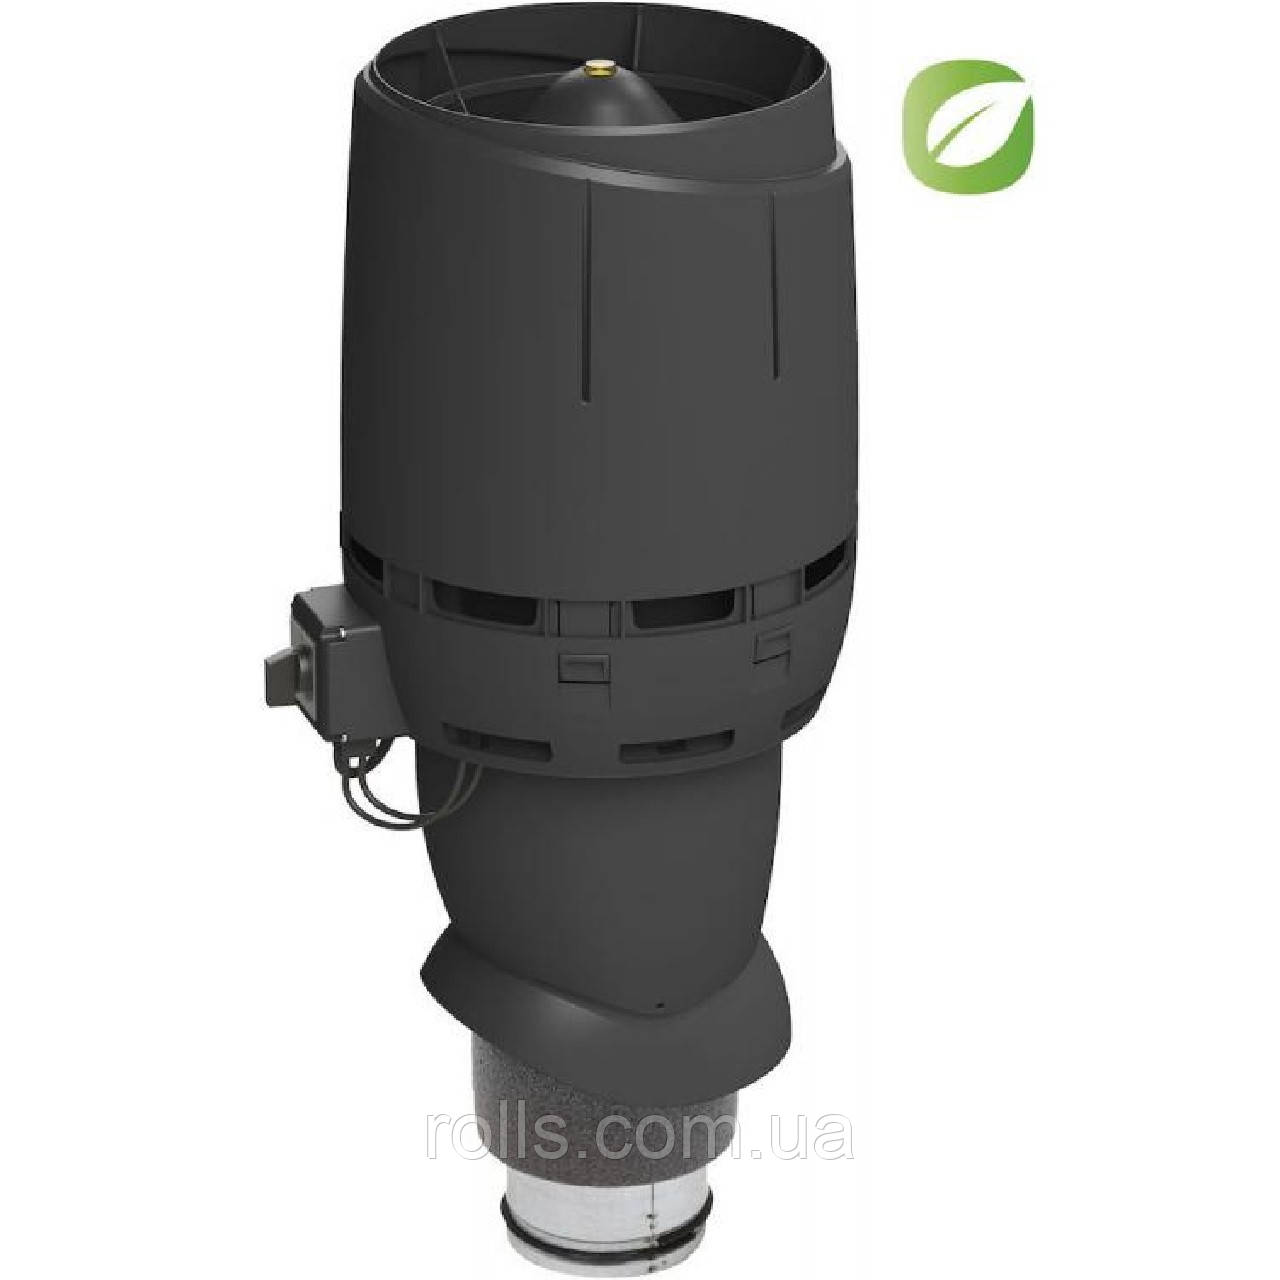 Вентилятор FLOW ECo 110 P Вентилятор VILPE